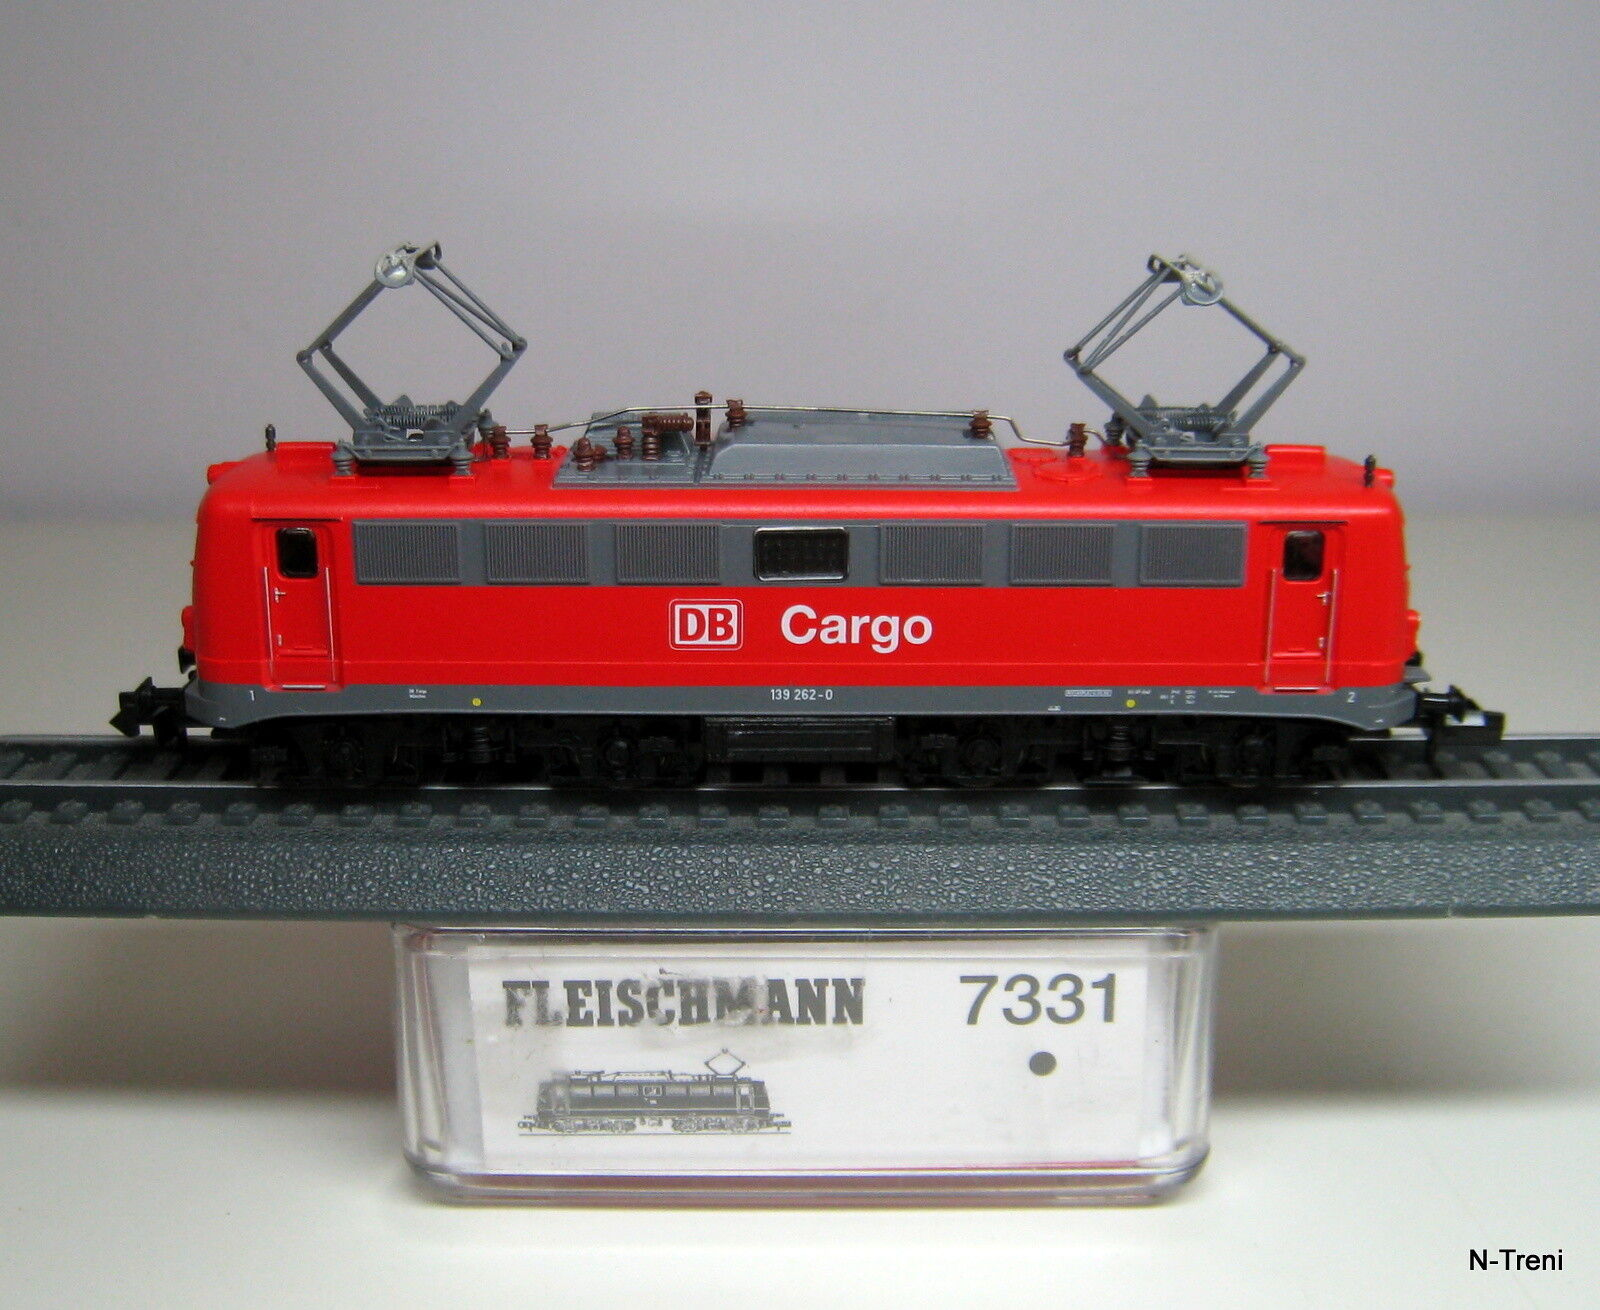 Fleischmann N 7331 - Loco elettrica universale BR 139 262-0 delle DB CocheGO, ep.V